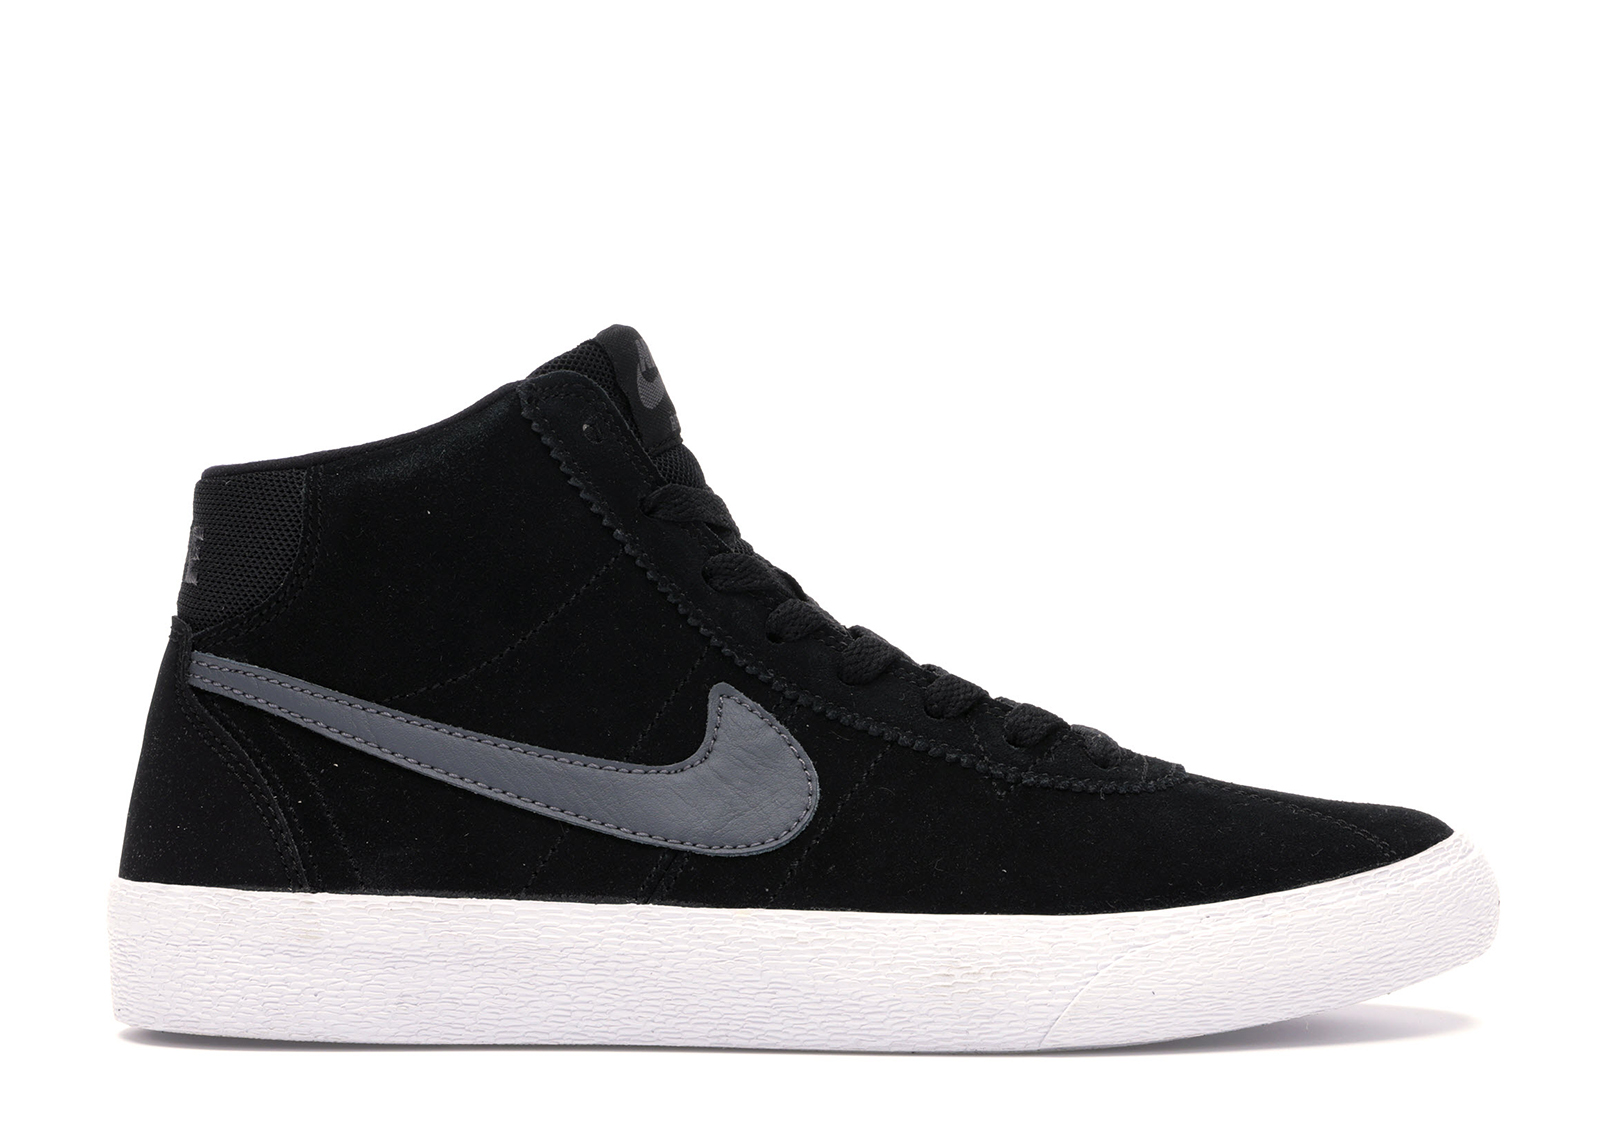 Nike SB Bruin High Black Dark Grey (W